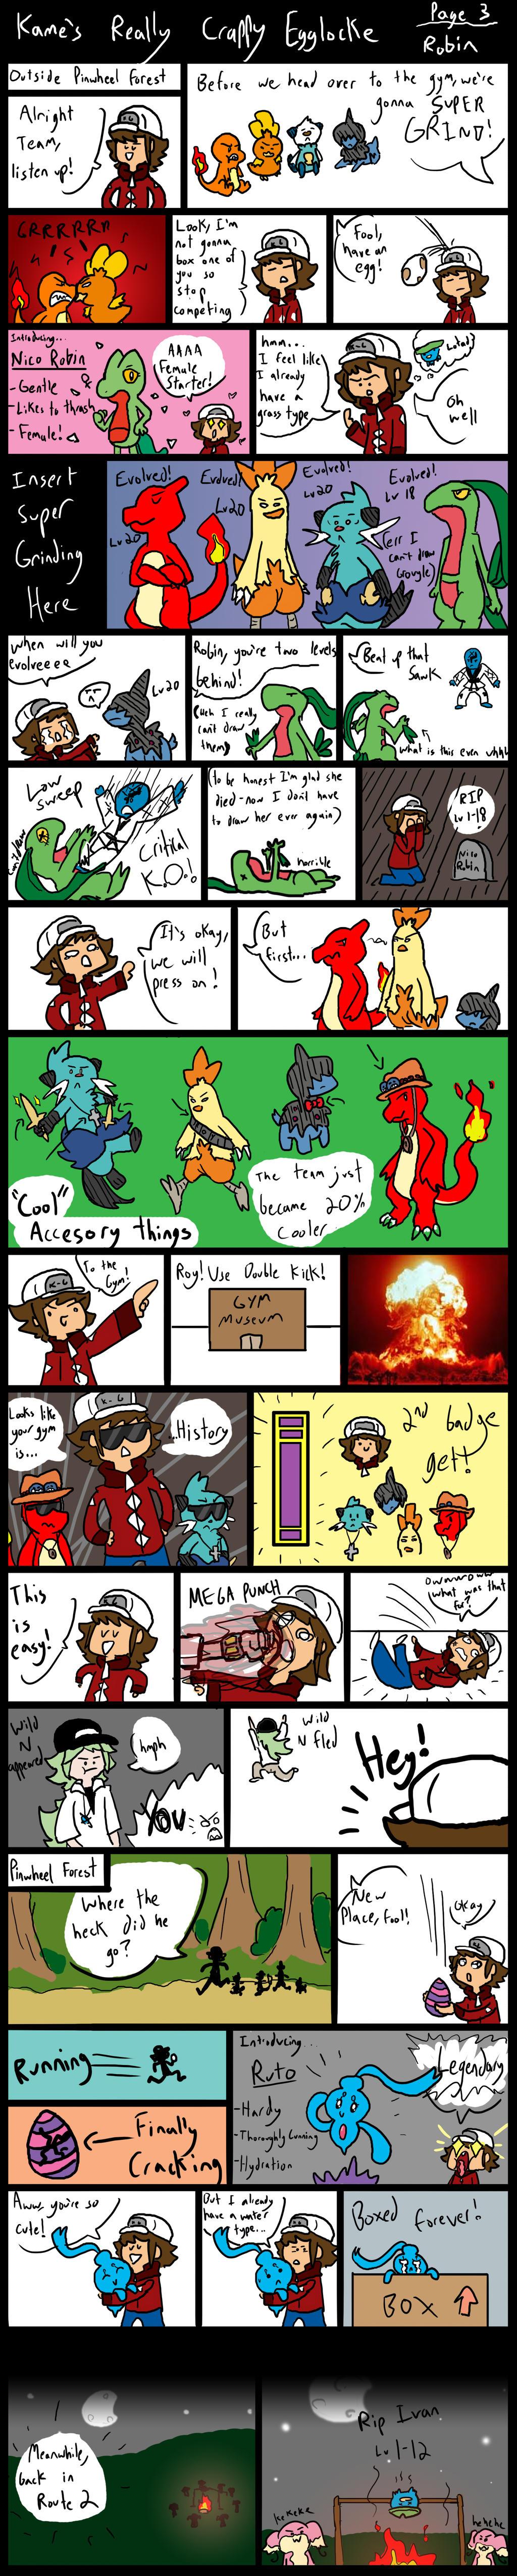 Kames Super Crappy Egglocke 3 by Kame-Ghost